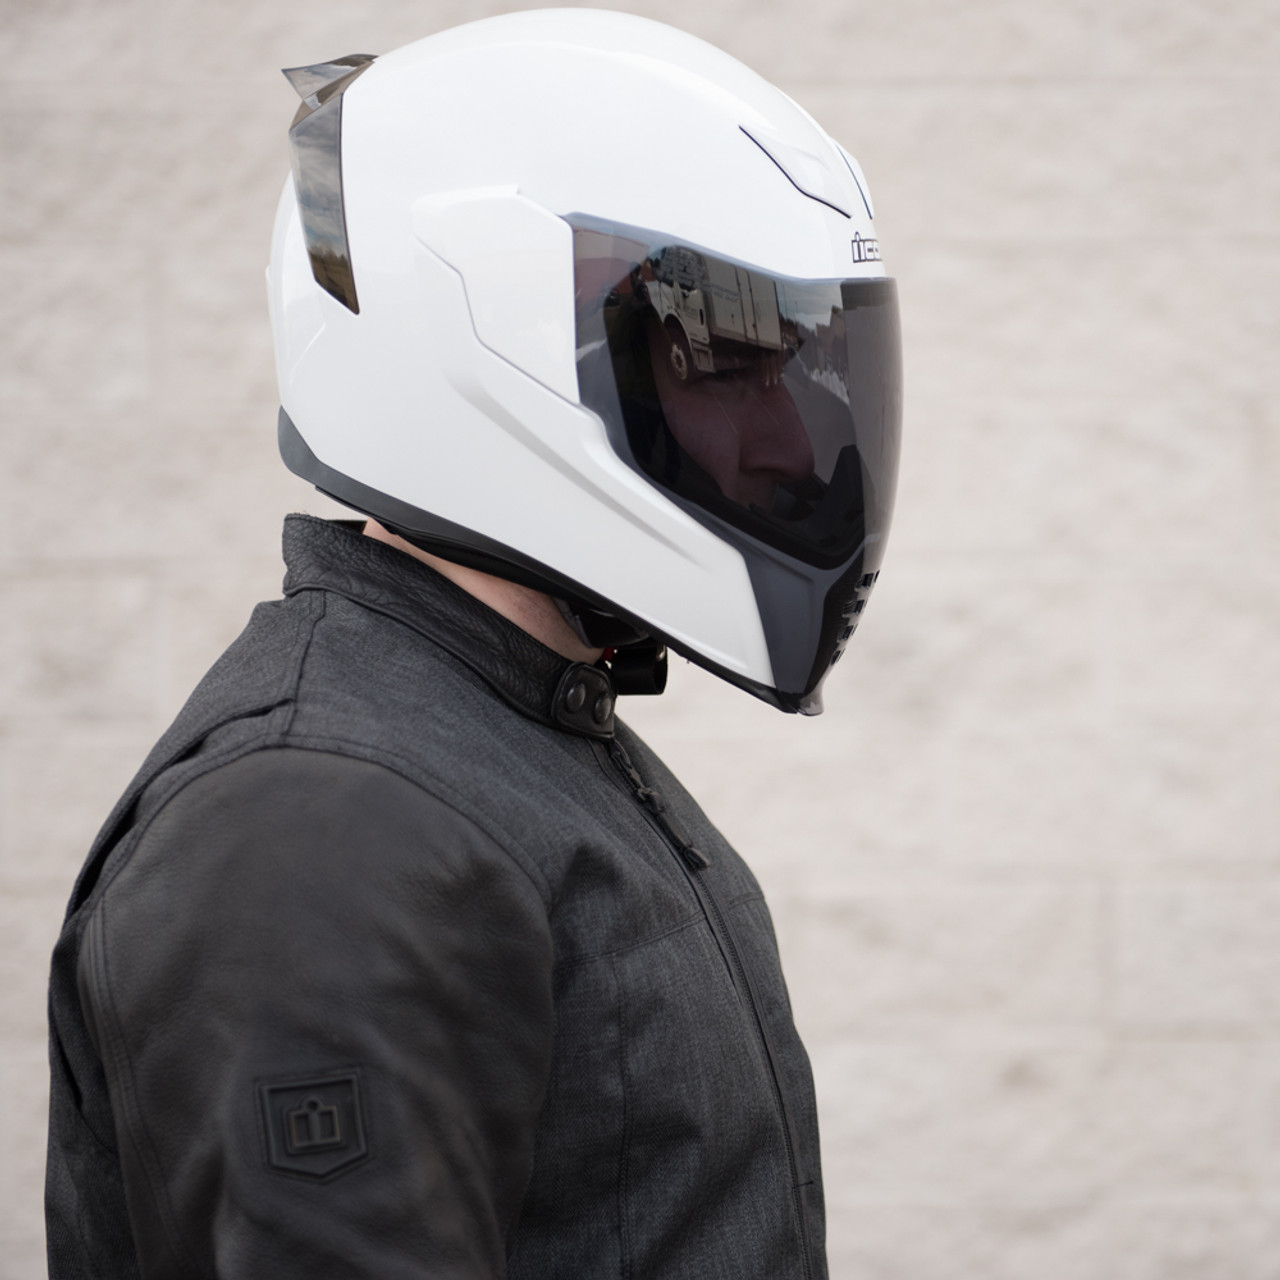 fed3cbab Icon Airflite Light Smoke Motorcycle Shield - 0130-0779 - Get ...